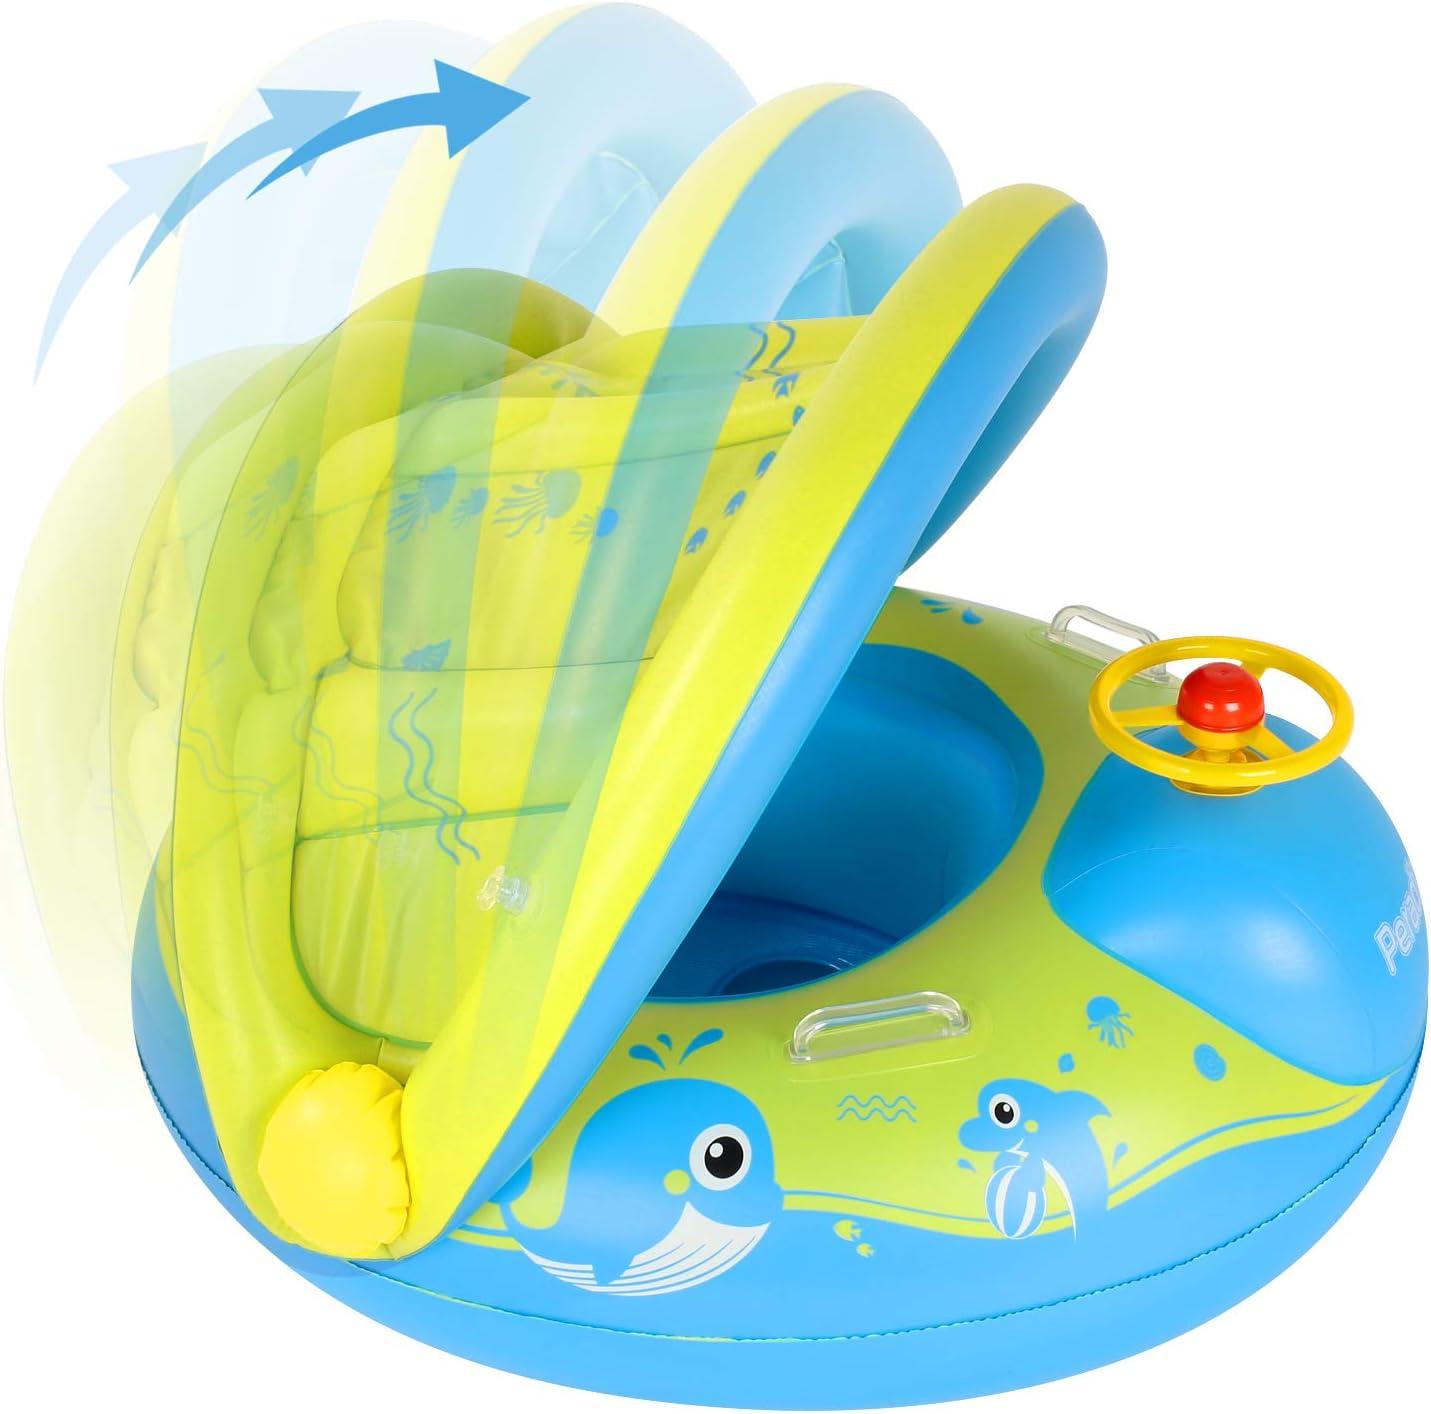 Peradix Flotador Bebé con Asiento, Flotador para Bebe Piscina ...